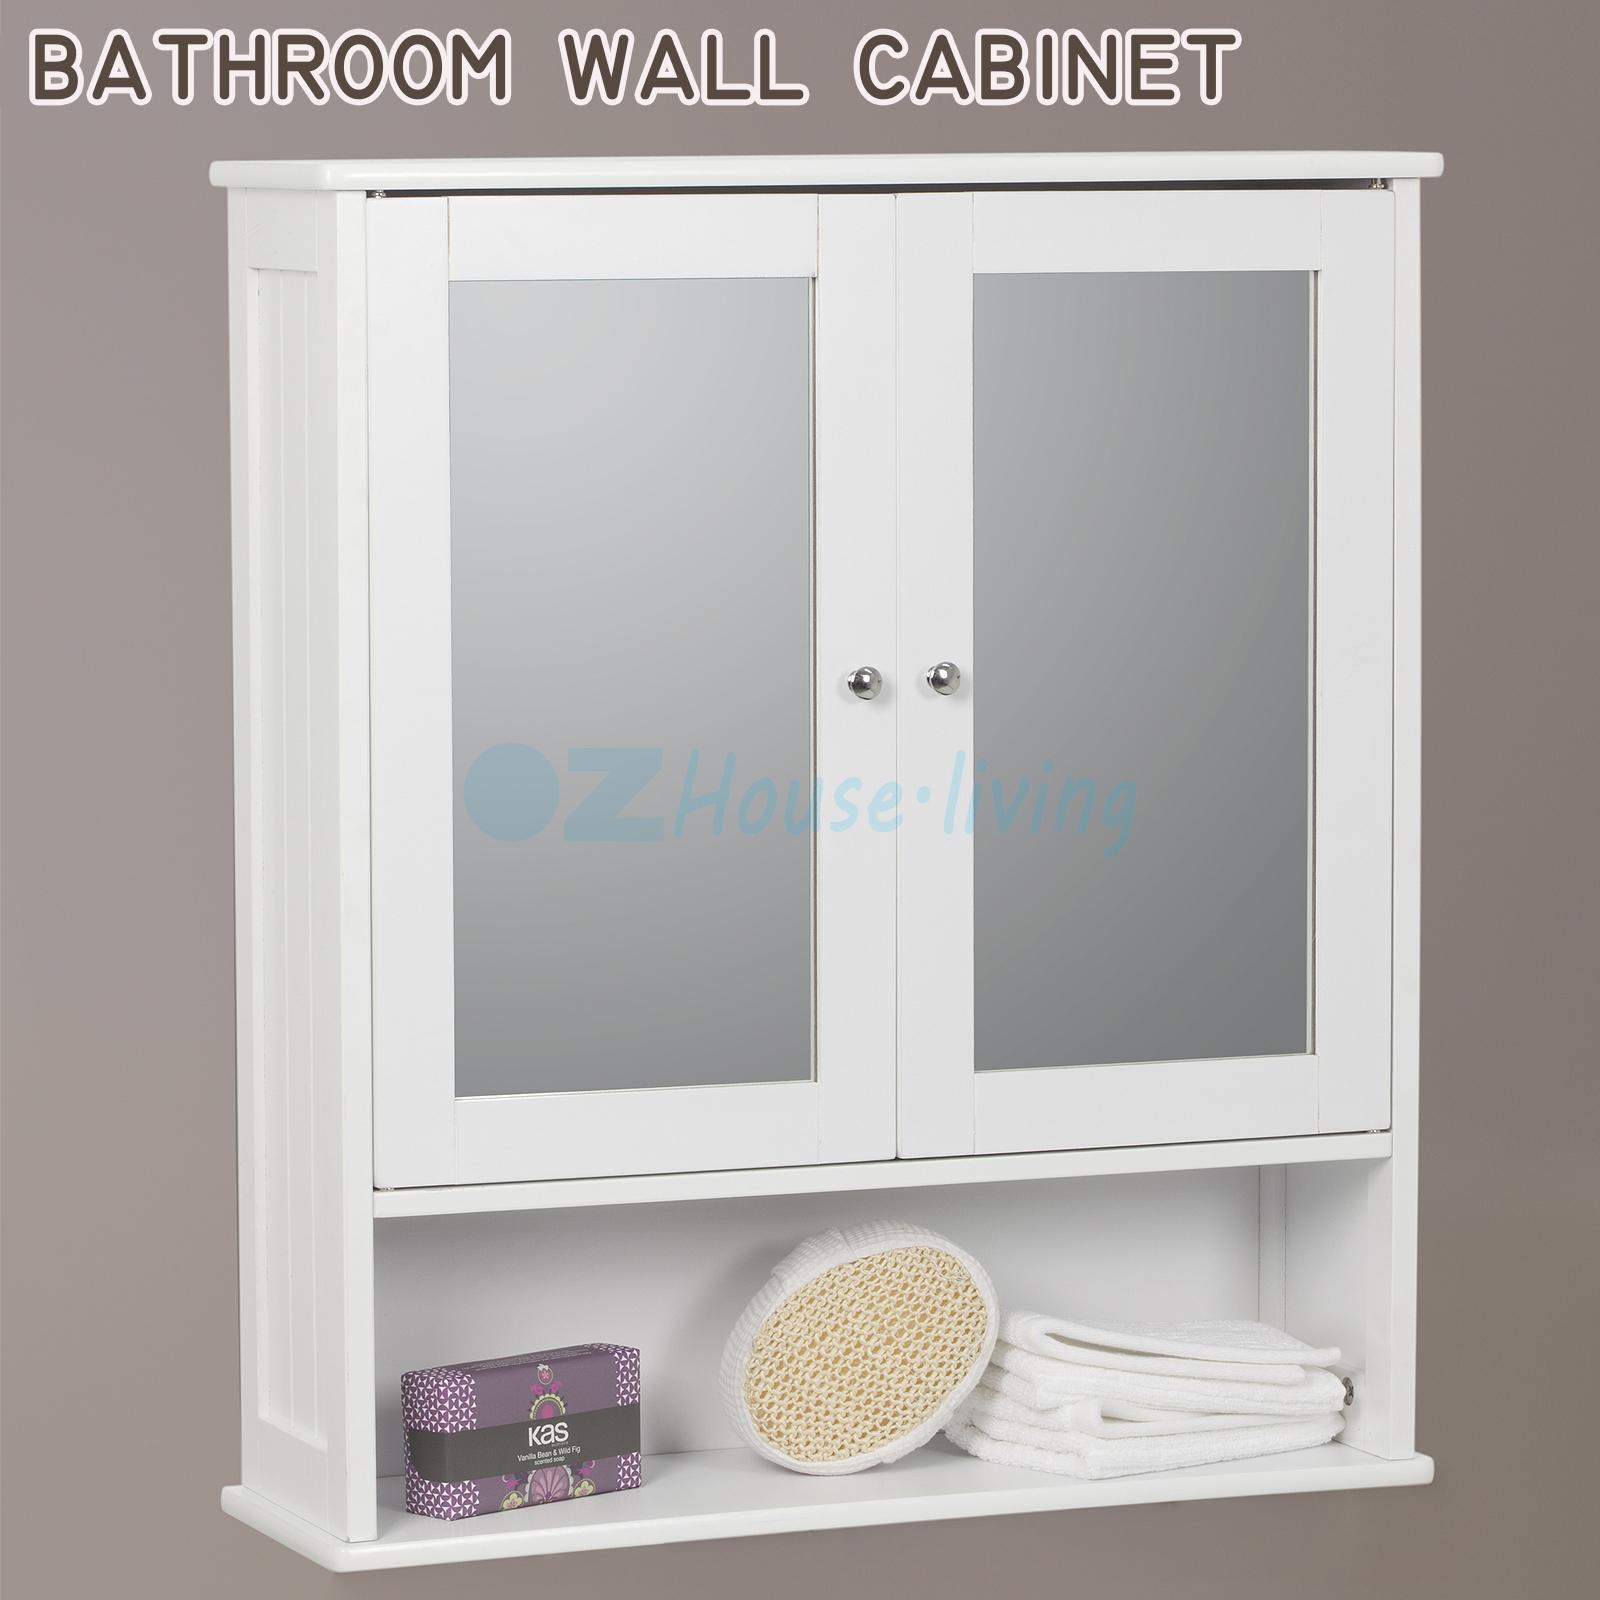 mirror door white wall bathroom cabinet storage organiser shelf